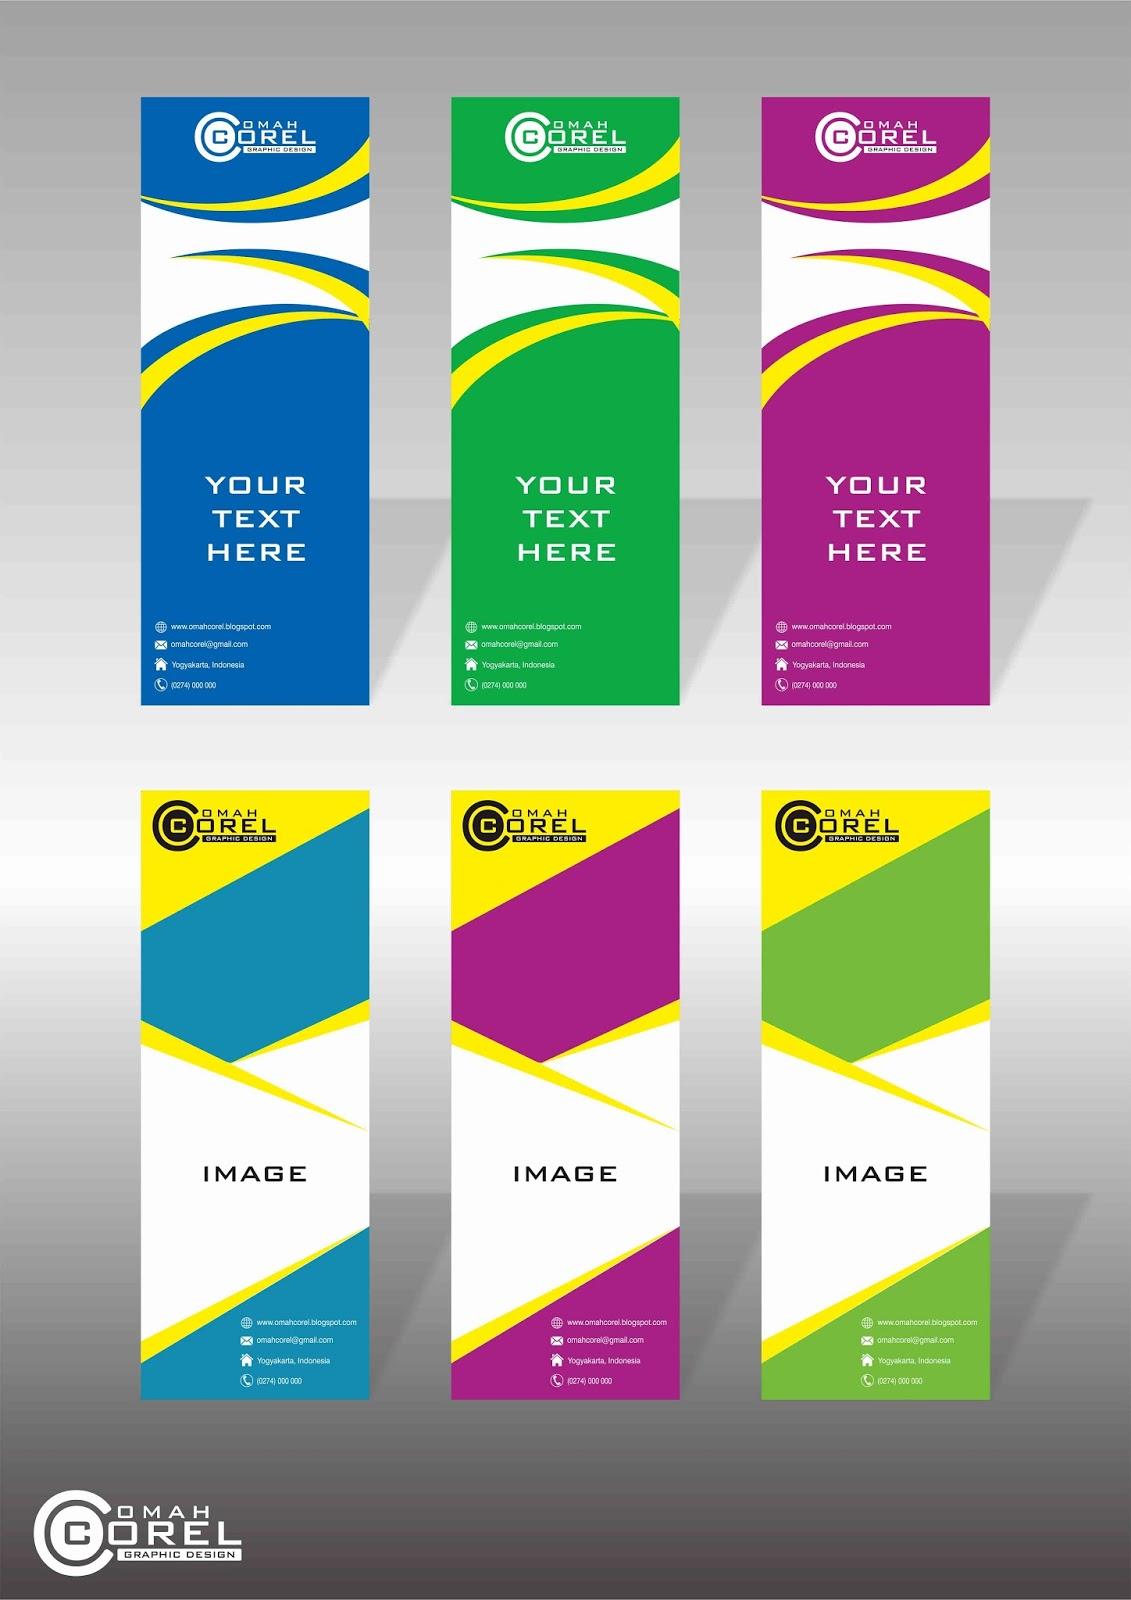 Desain Background X-Banner Vektor CDR | Omah Corel